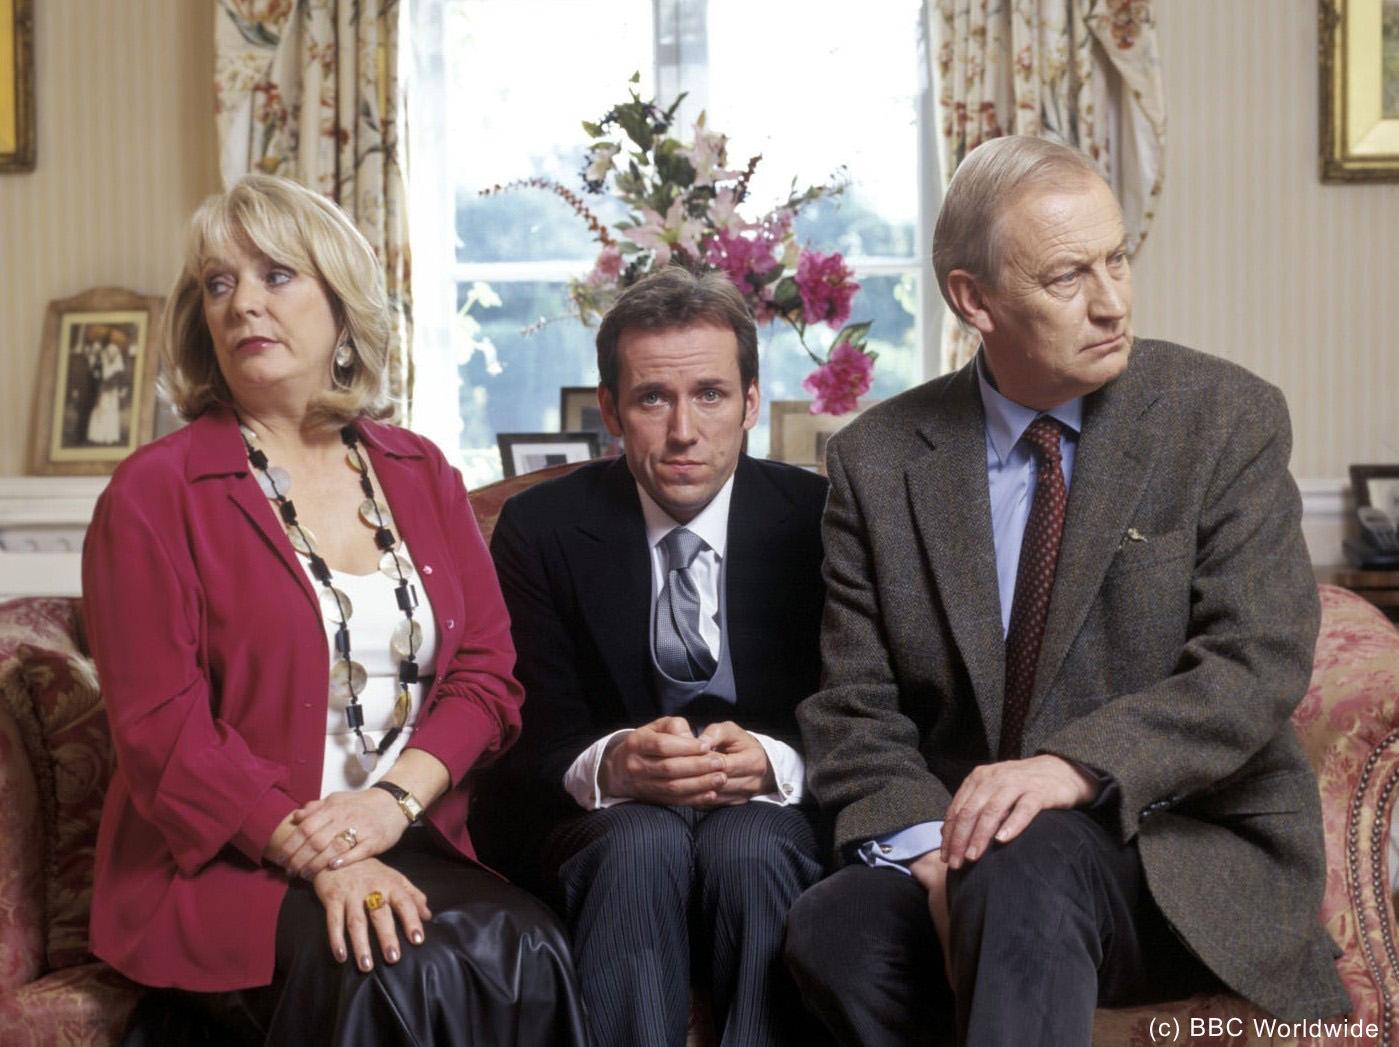 Ben Miller, Alison Steadman, and Geoffrey Whitehead in The Worst Week of My Life (2004)